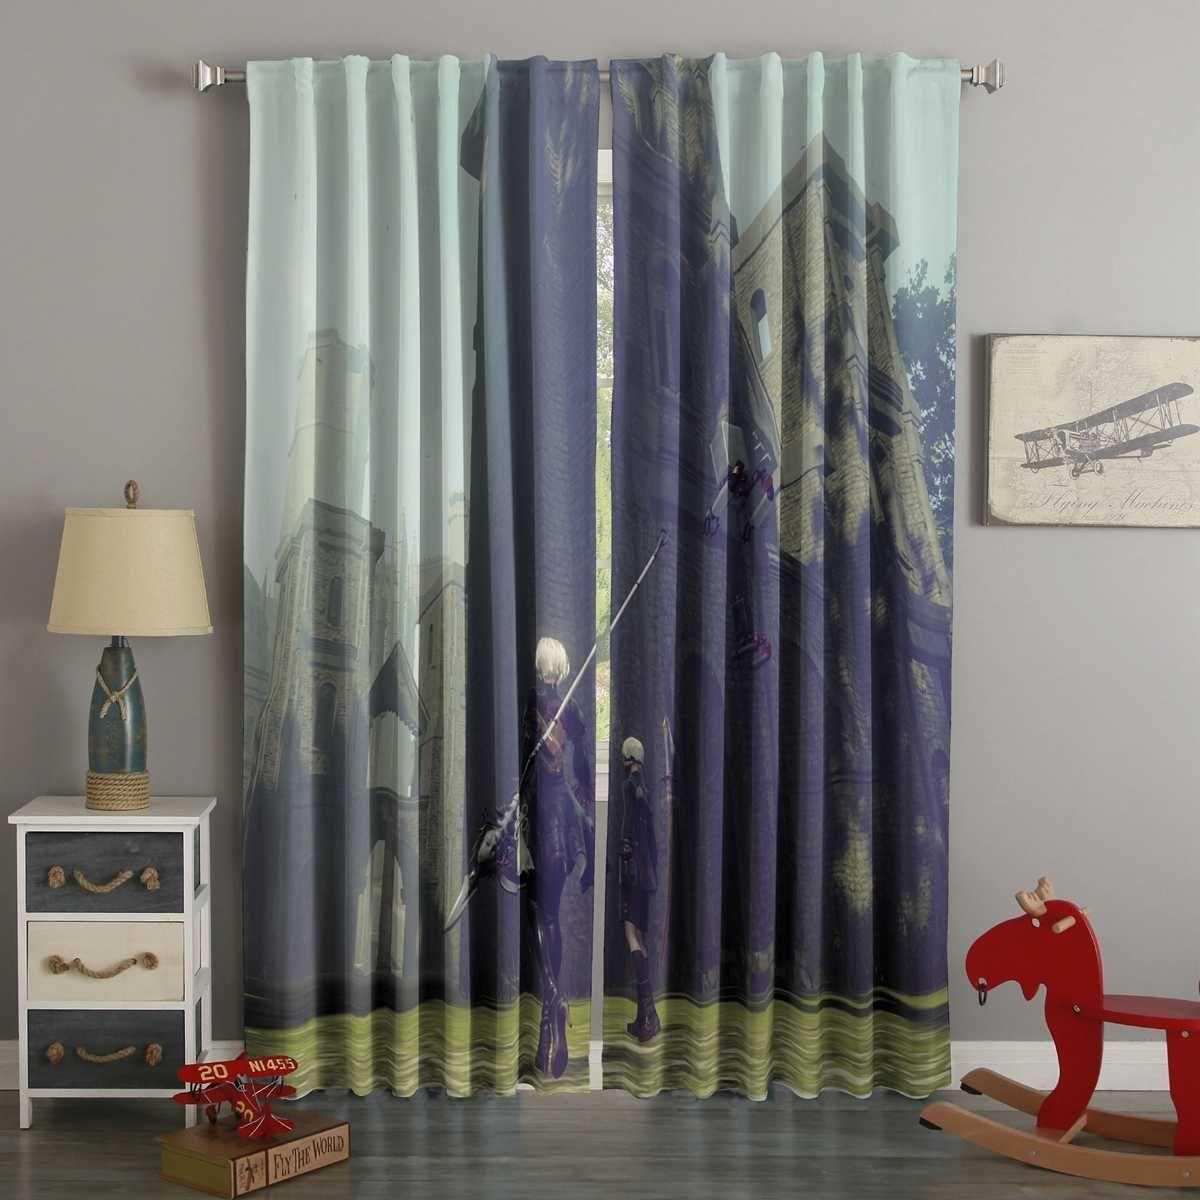 D printed nier automata style custom living room curtains